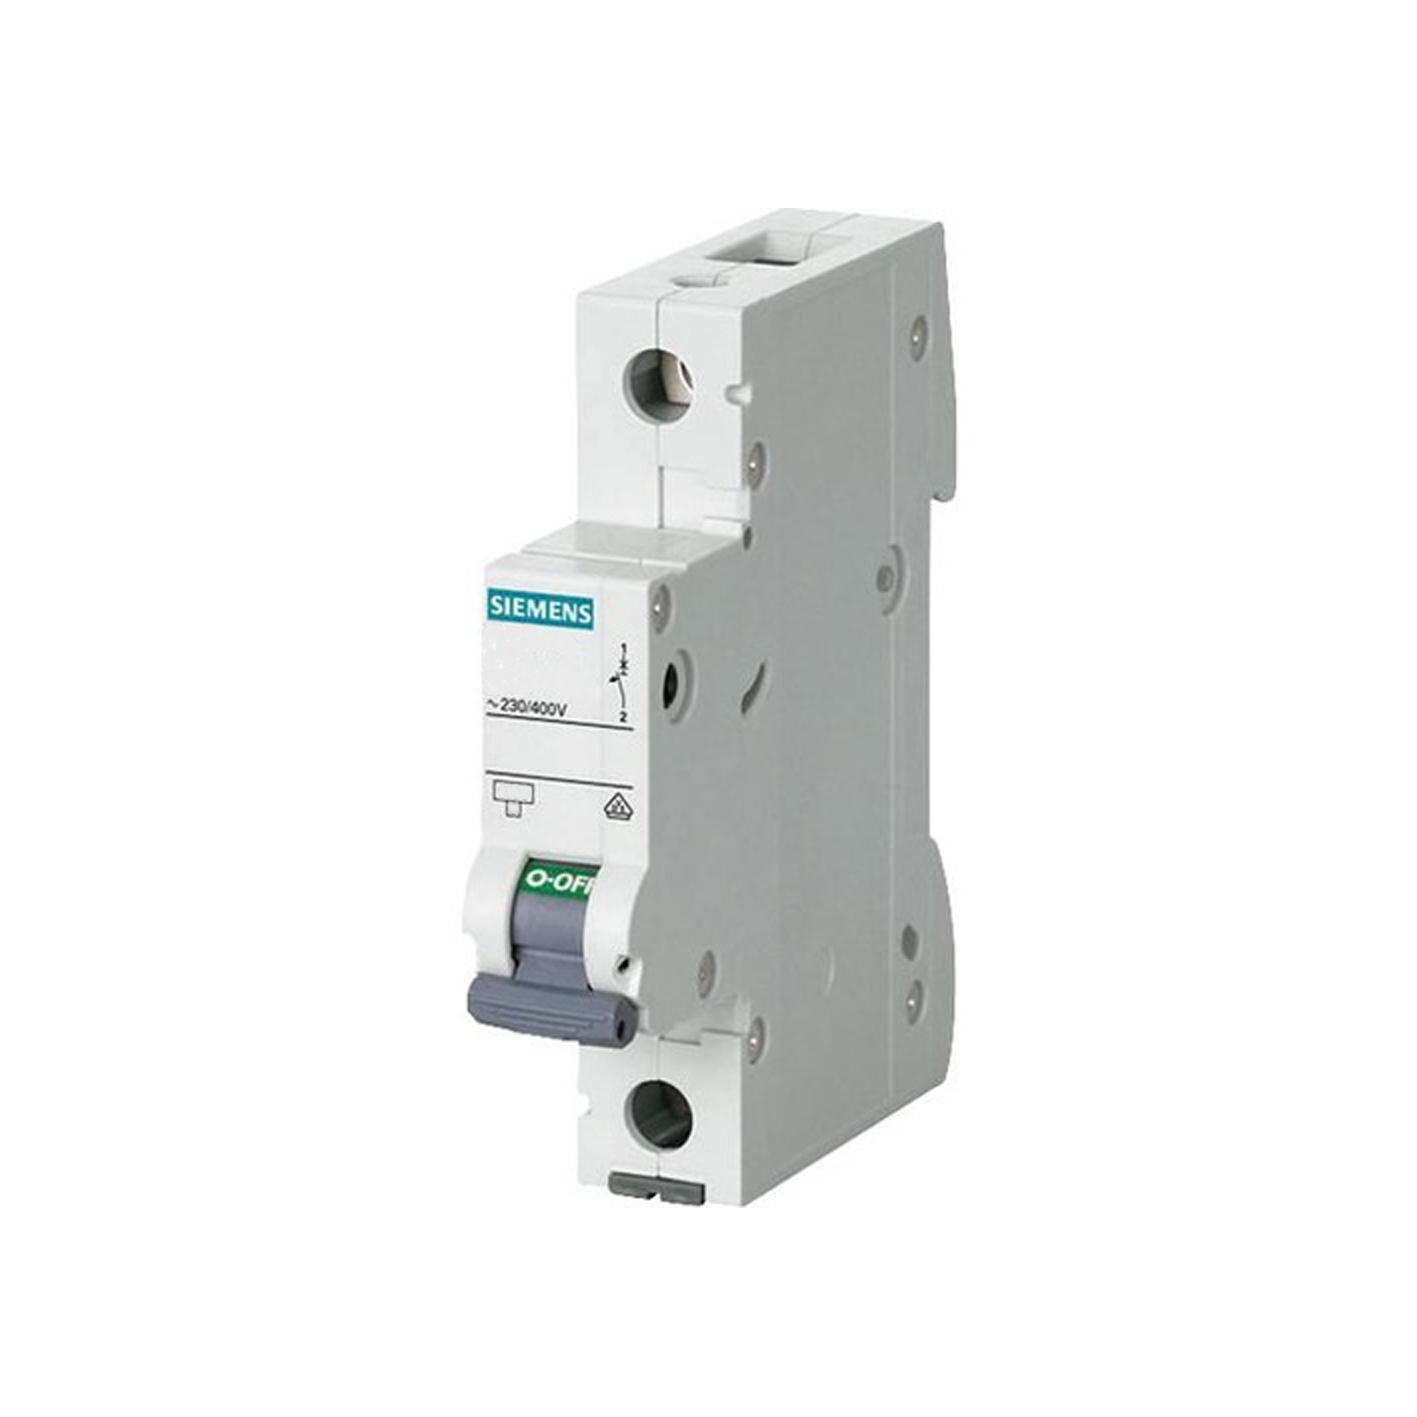 Siemens 1x10A Otomatik Sigorta